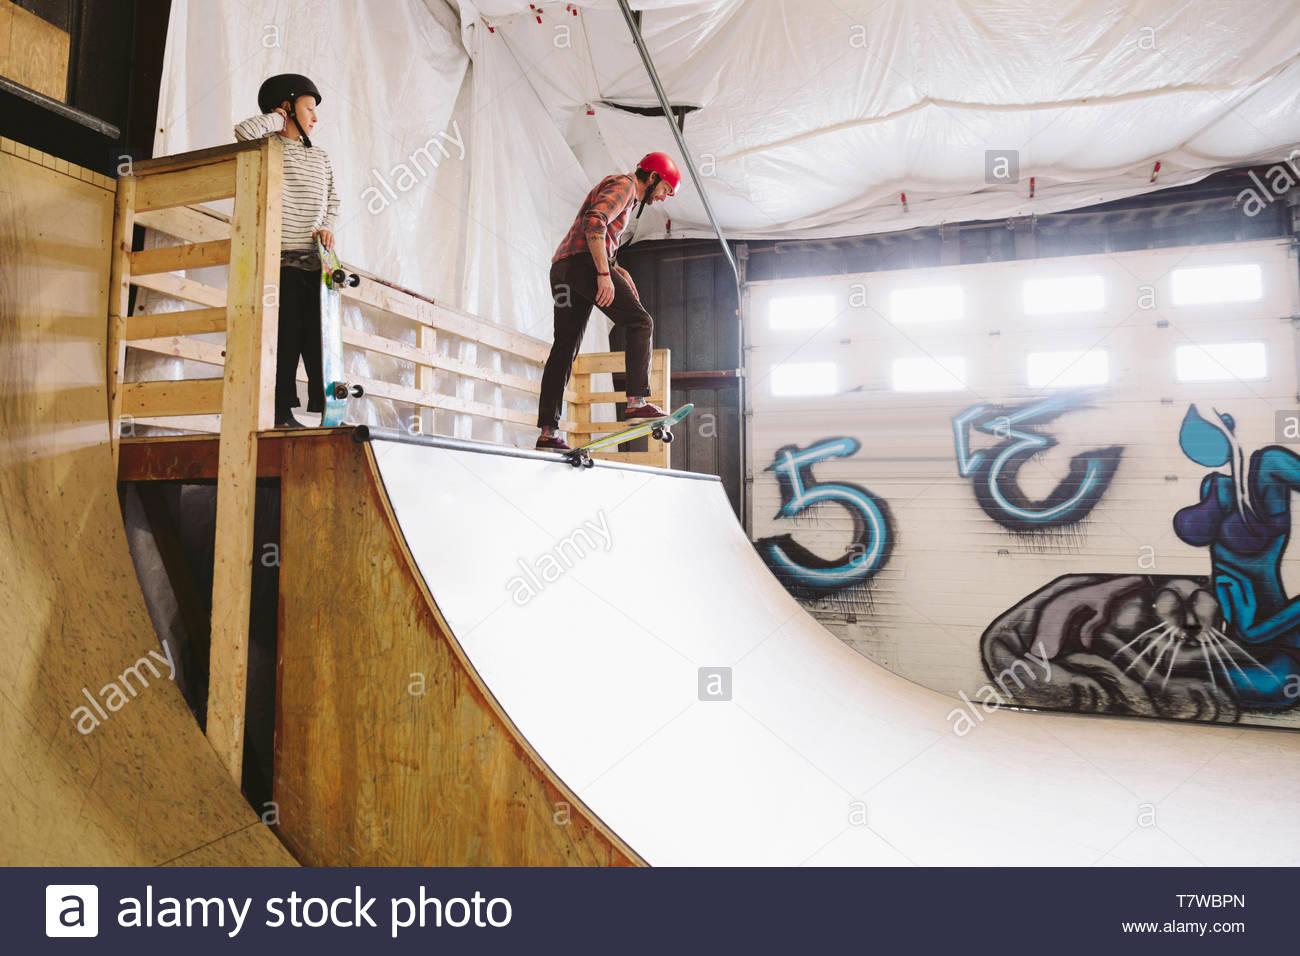 Mature man skateboarding at top of ramp at indoor skate park - Stock Image